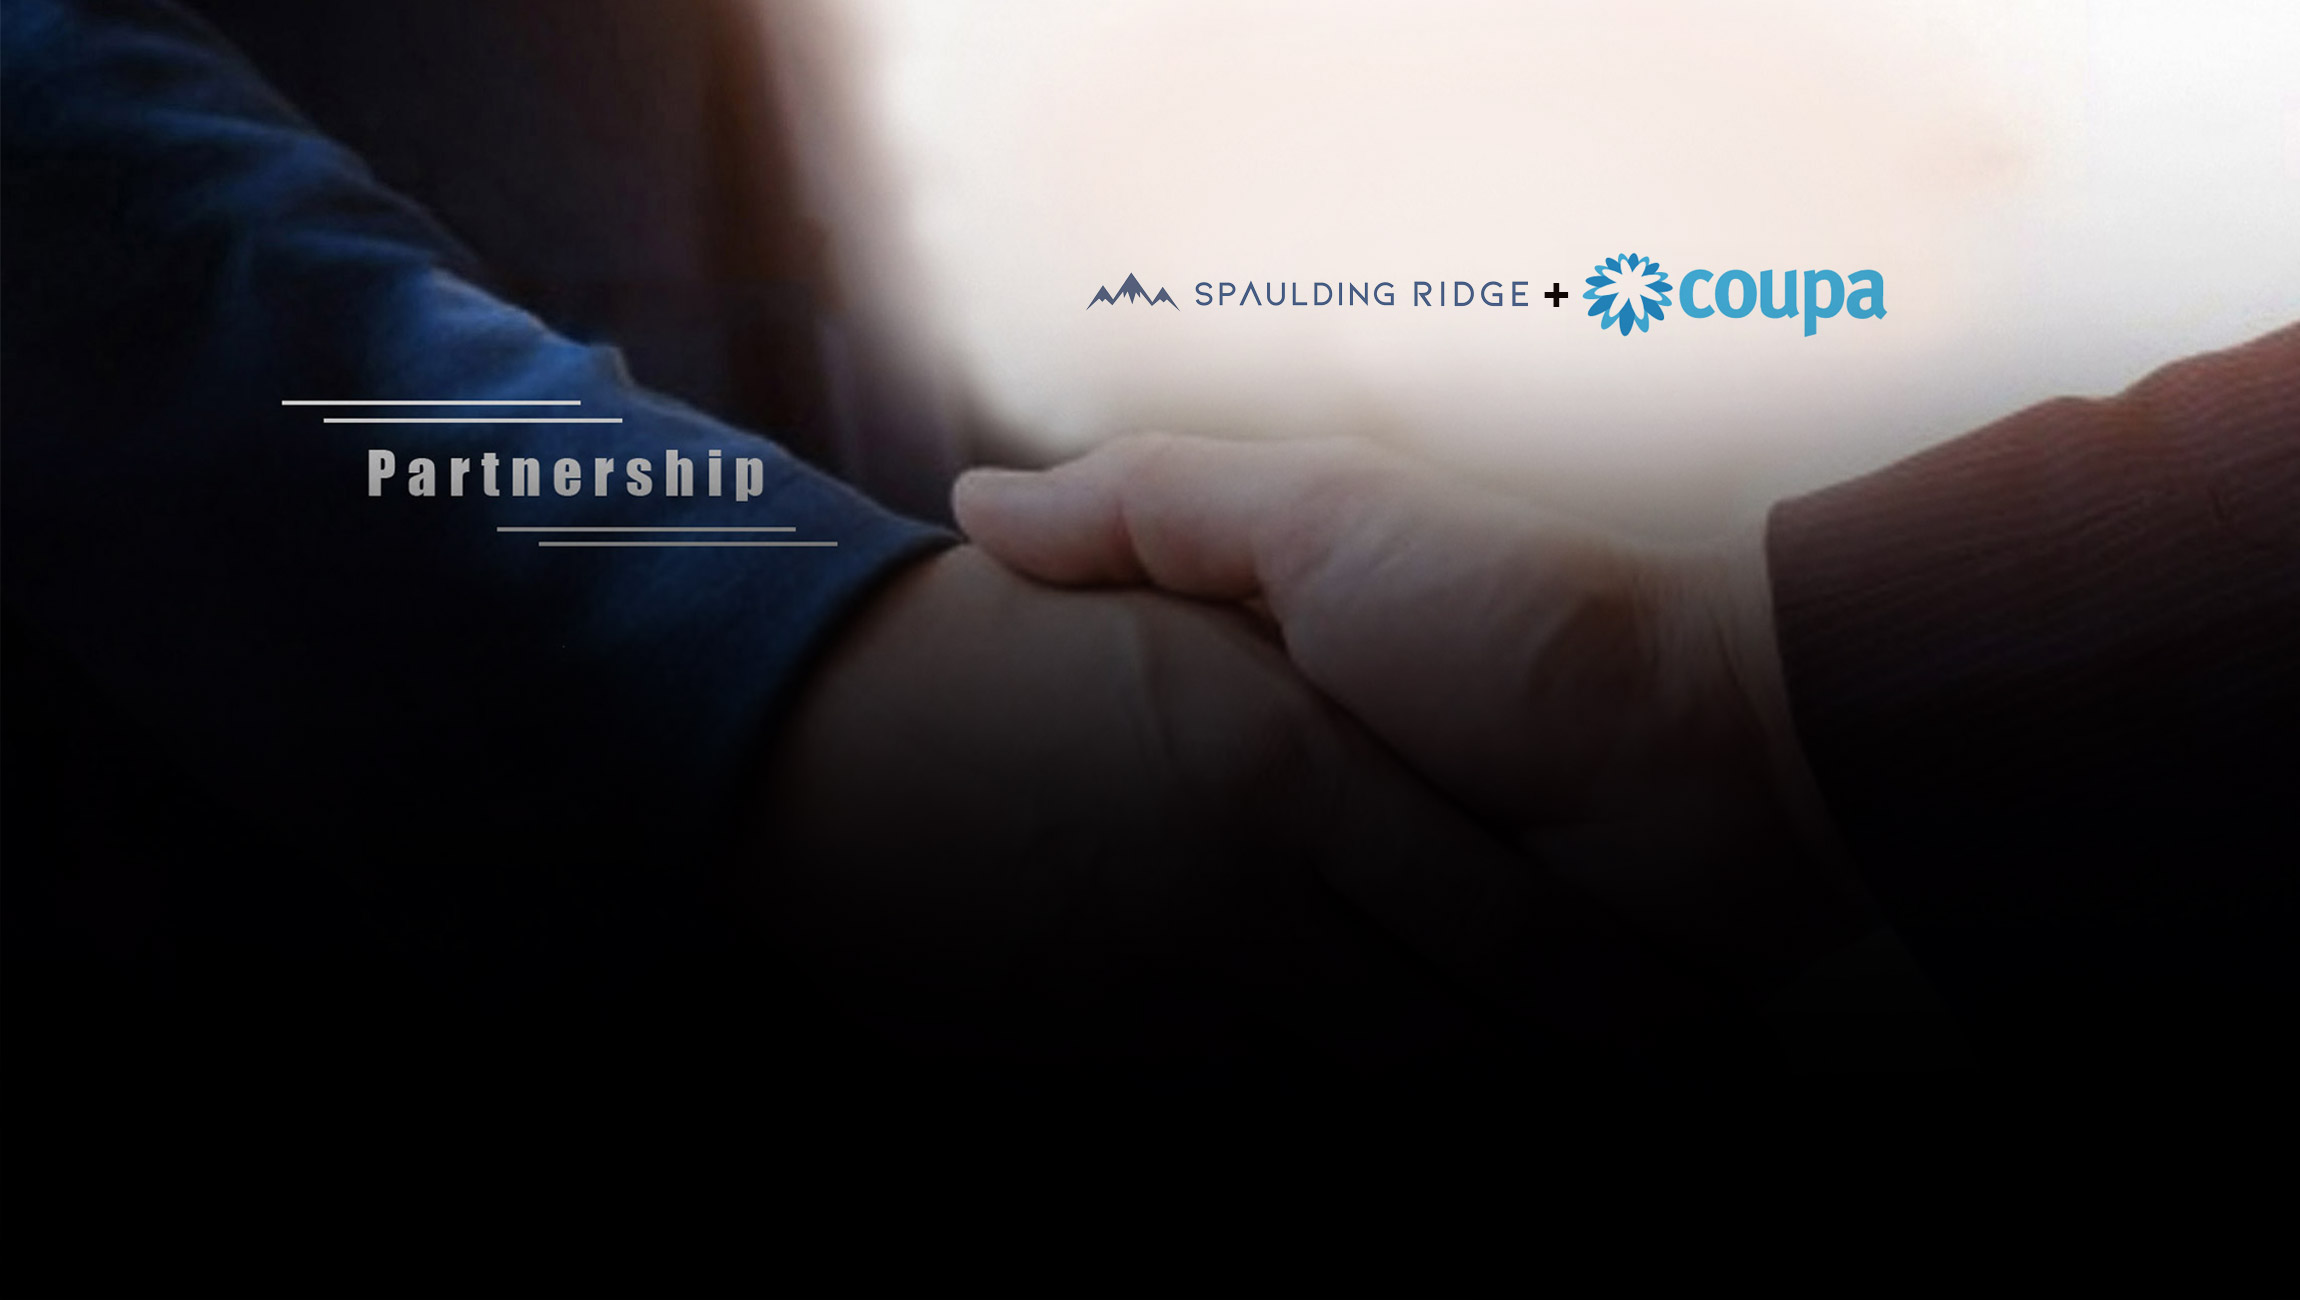 Spaulding Ridge Announces Strategic Partnership with Coupa Software